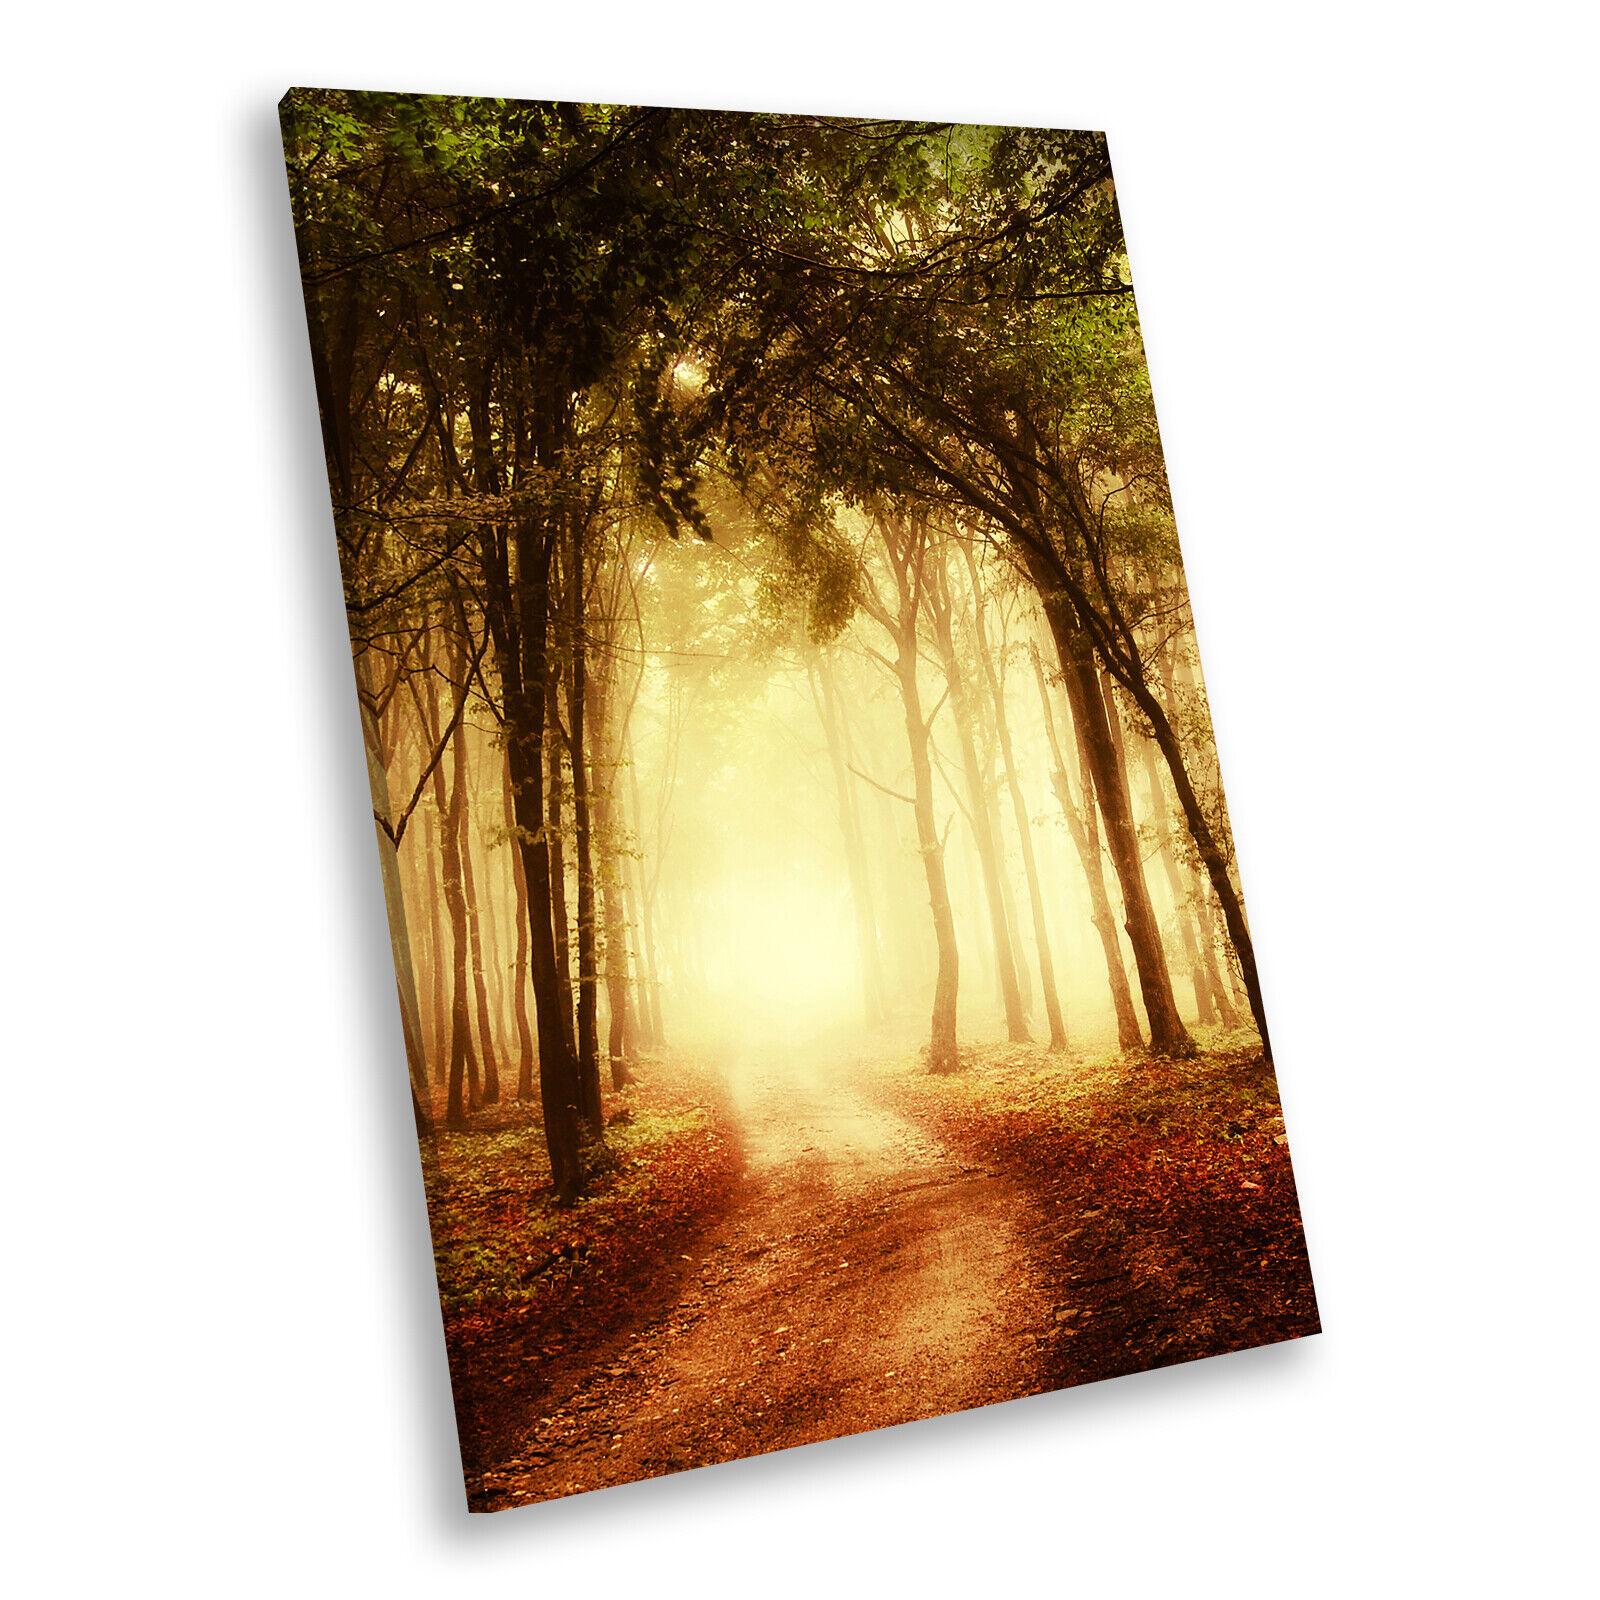 Retro Orange Forest Nature Portrait Scenic Canvas Wall Art Large Picture Prints